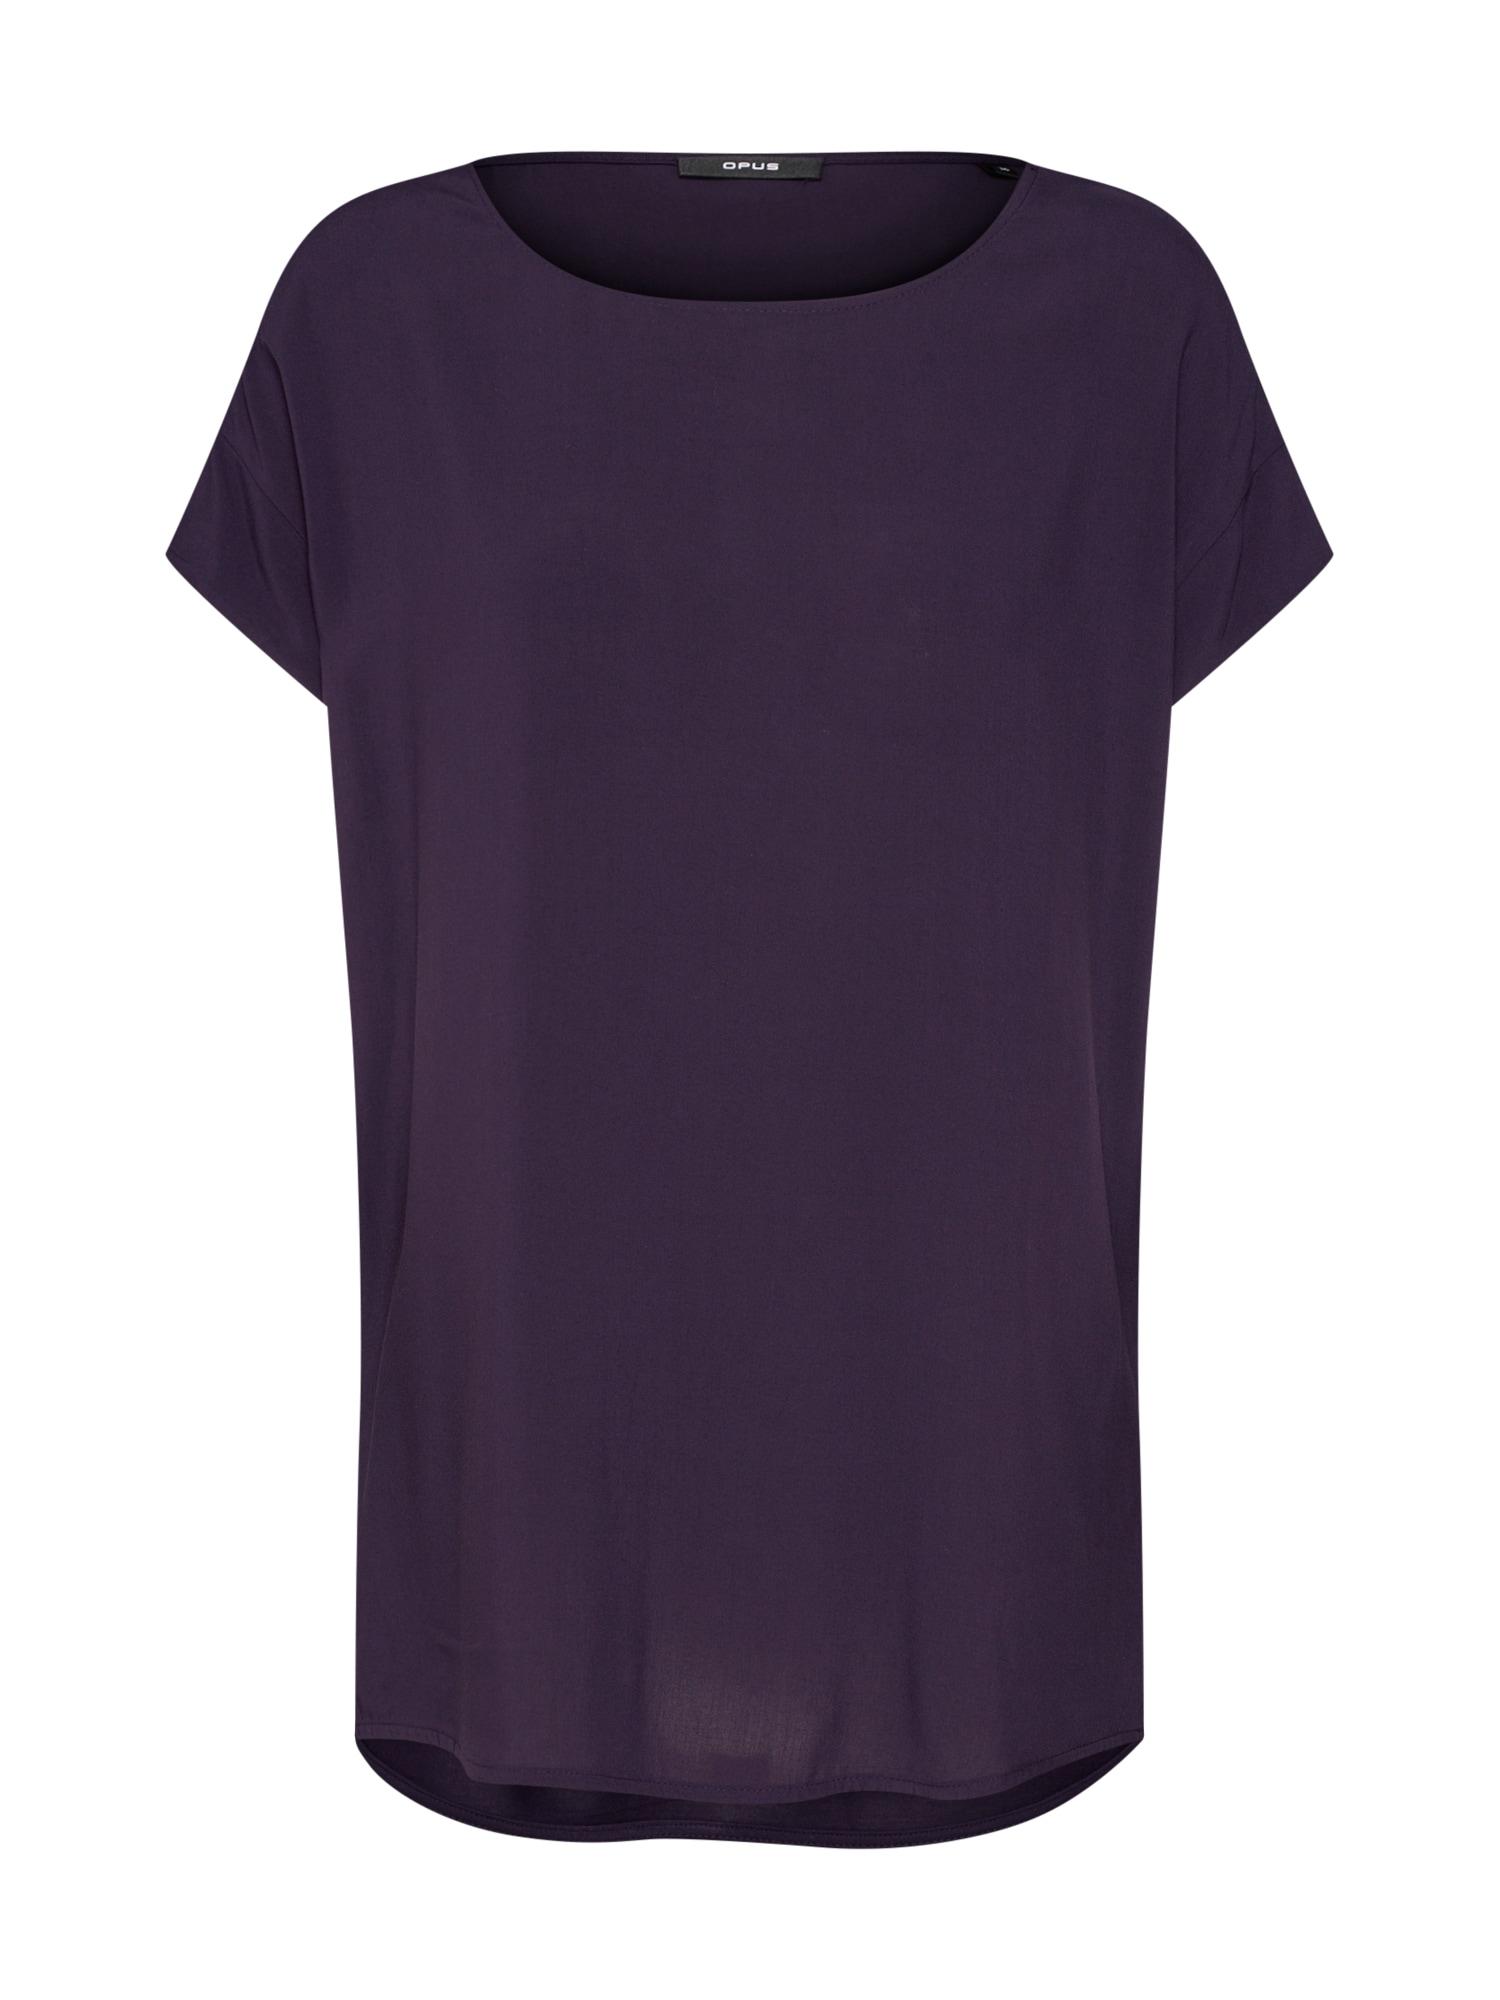 Tričko Skita fialová OPUS